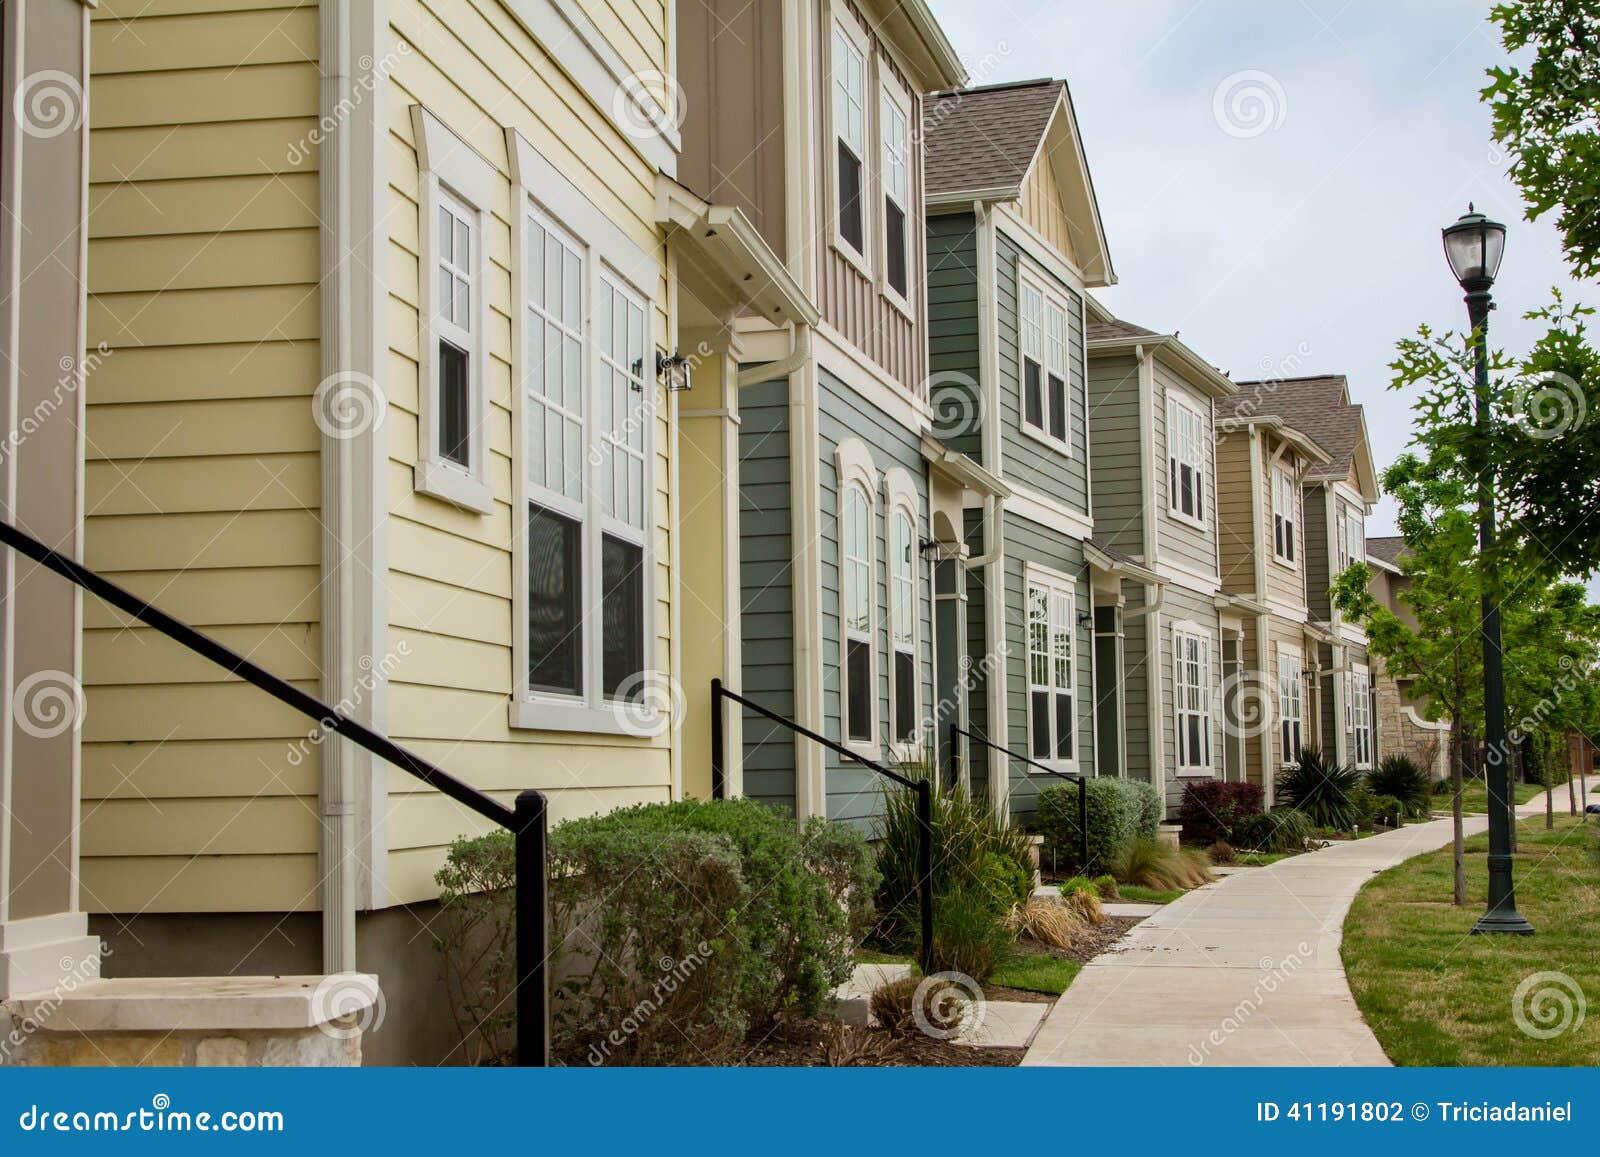 Klassische Häuser In Bergen Stockfoto - Bild: 41191802 size: 1300 x 957 post ID: 8 File size: 0 B